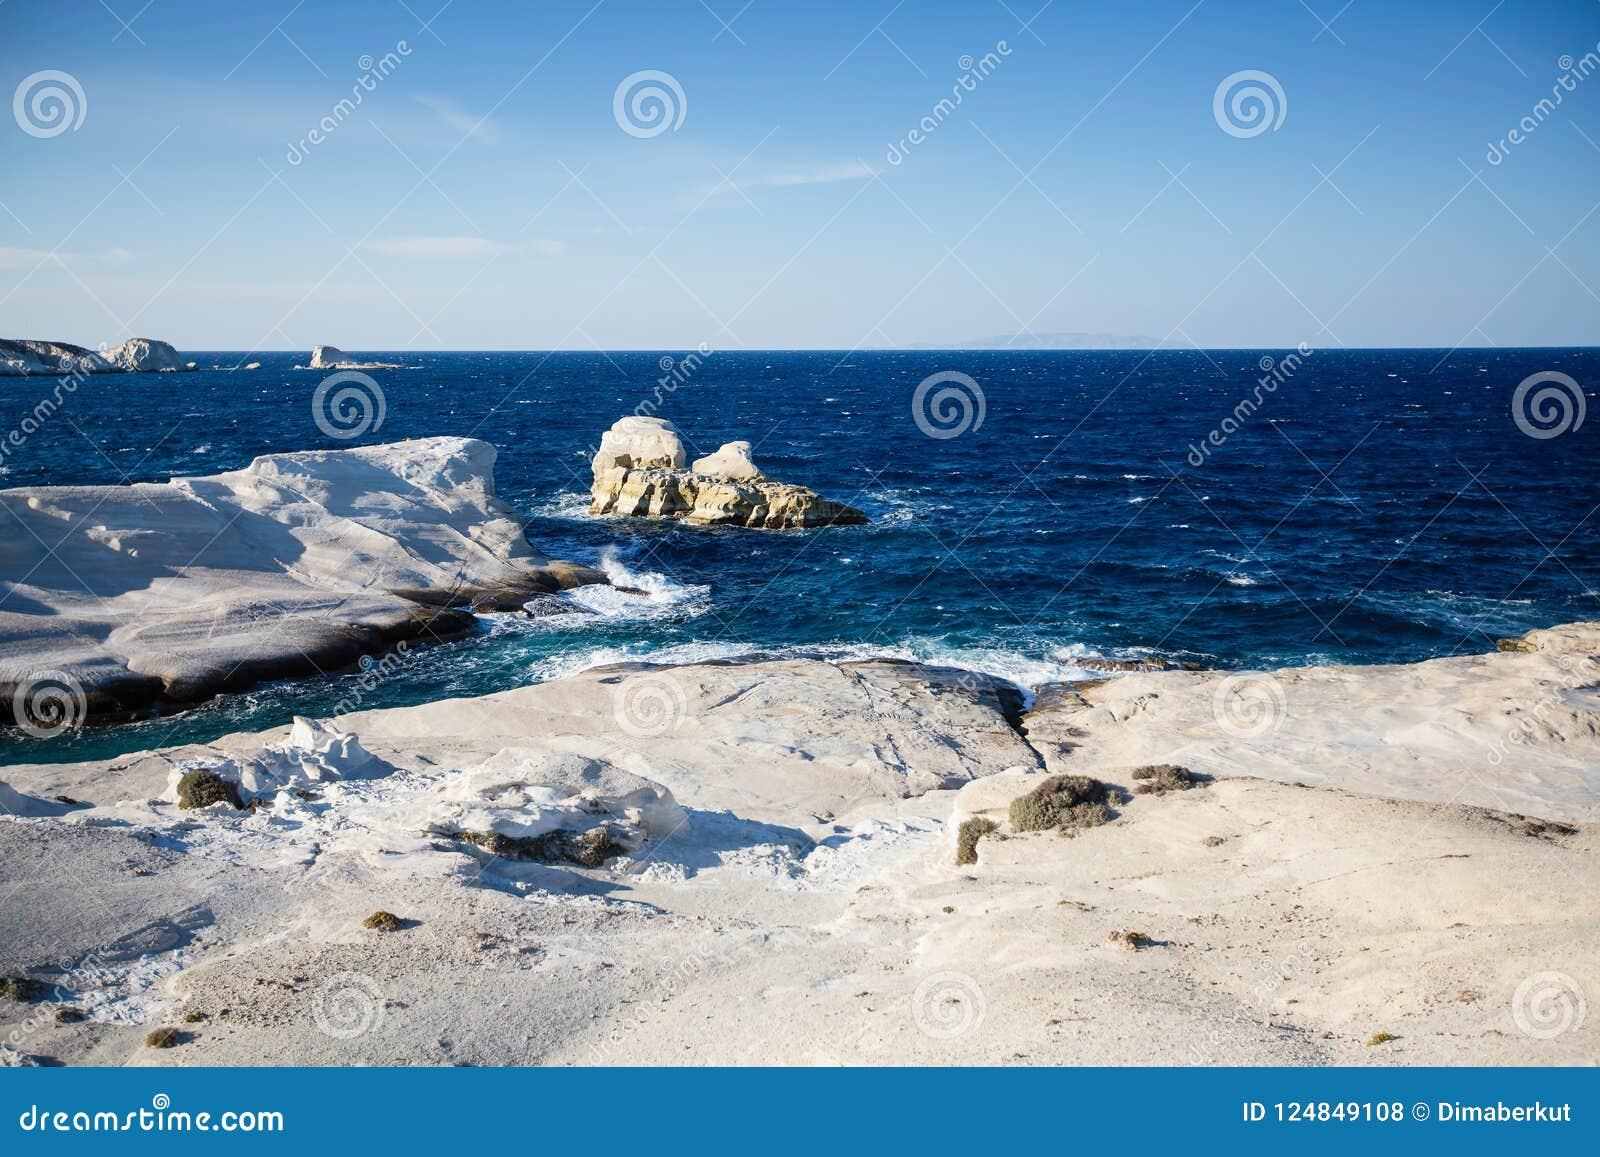 Ð芦粟海岛,爱琴海,希腊¡烘炉  自然